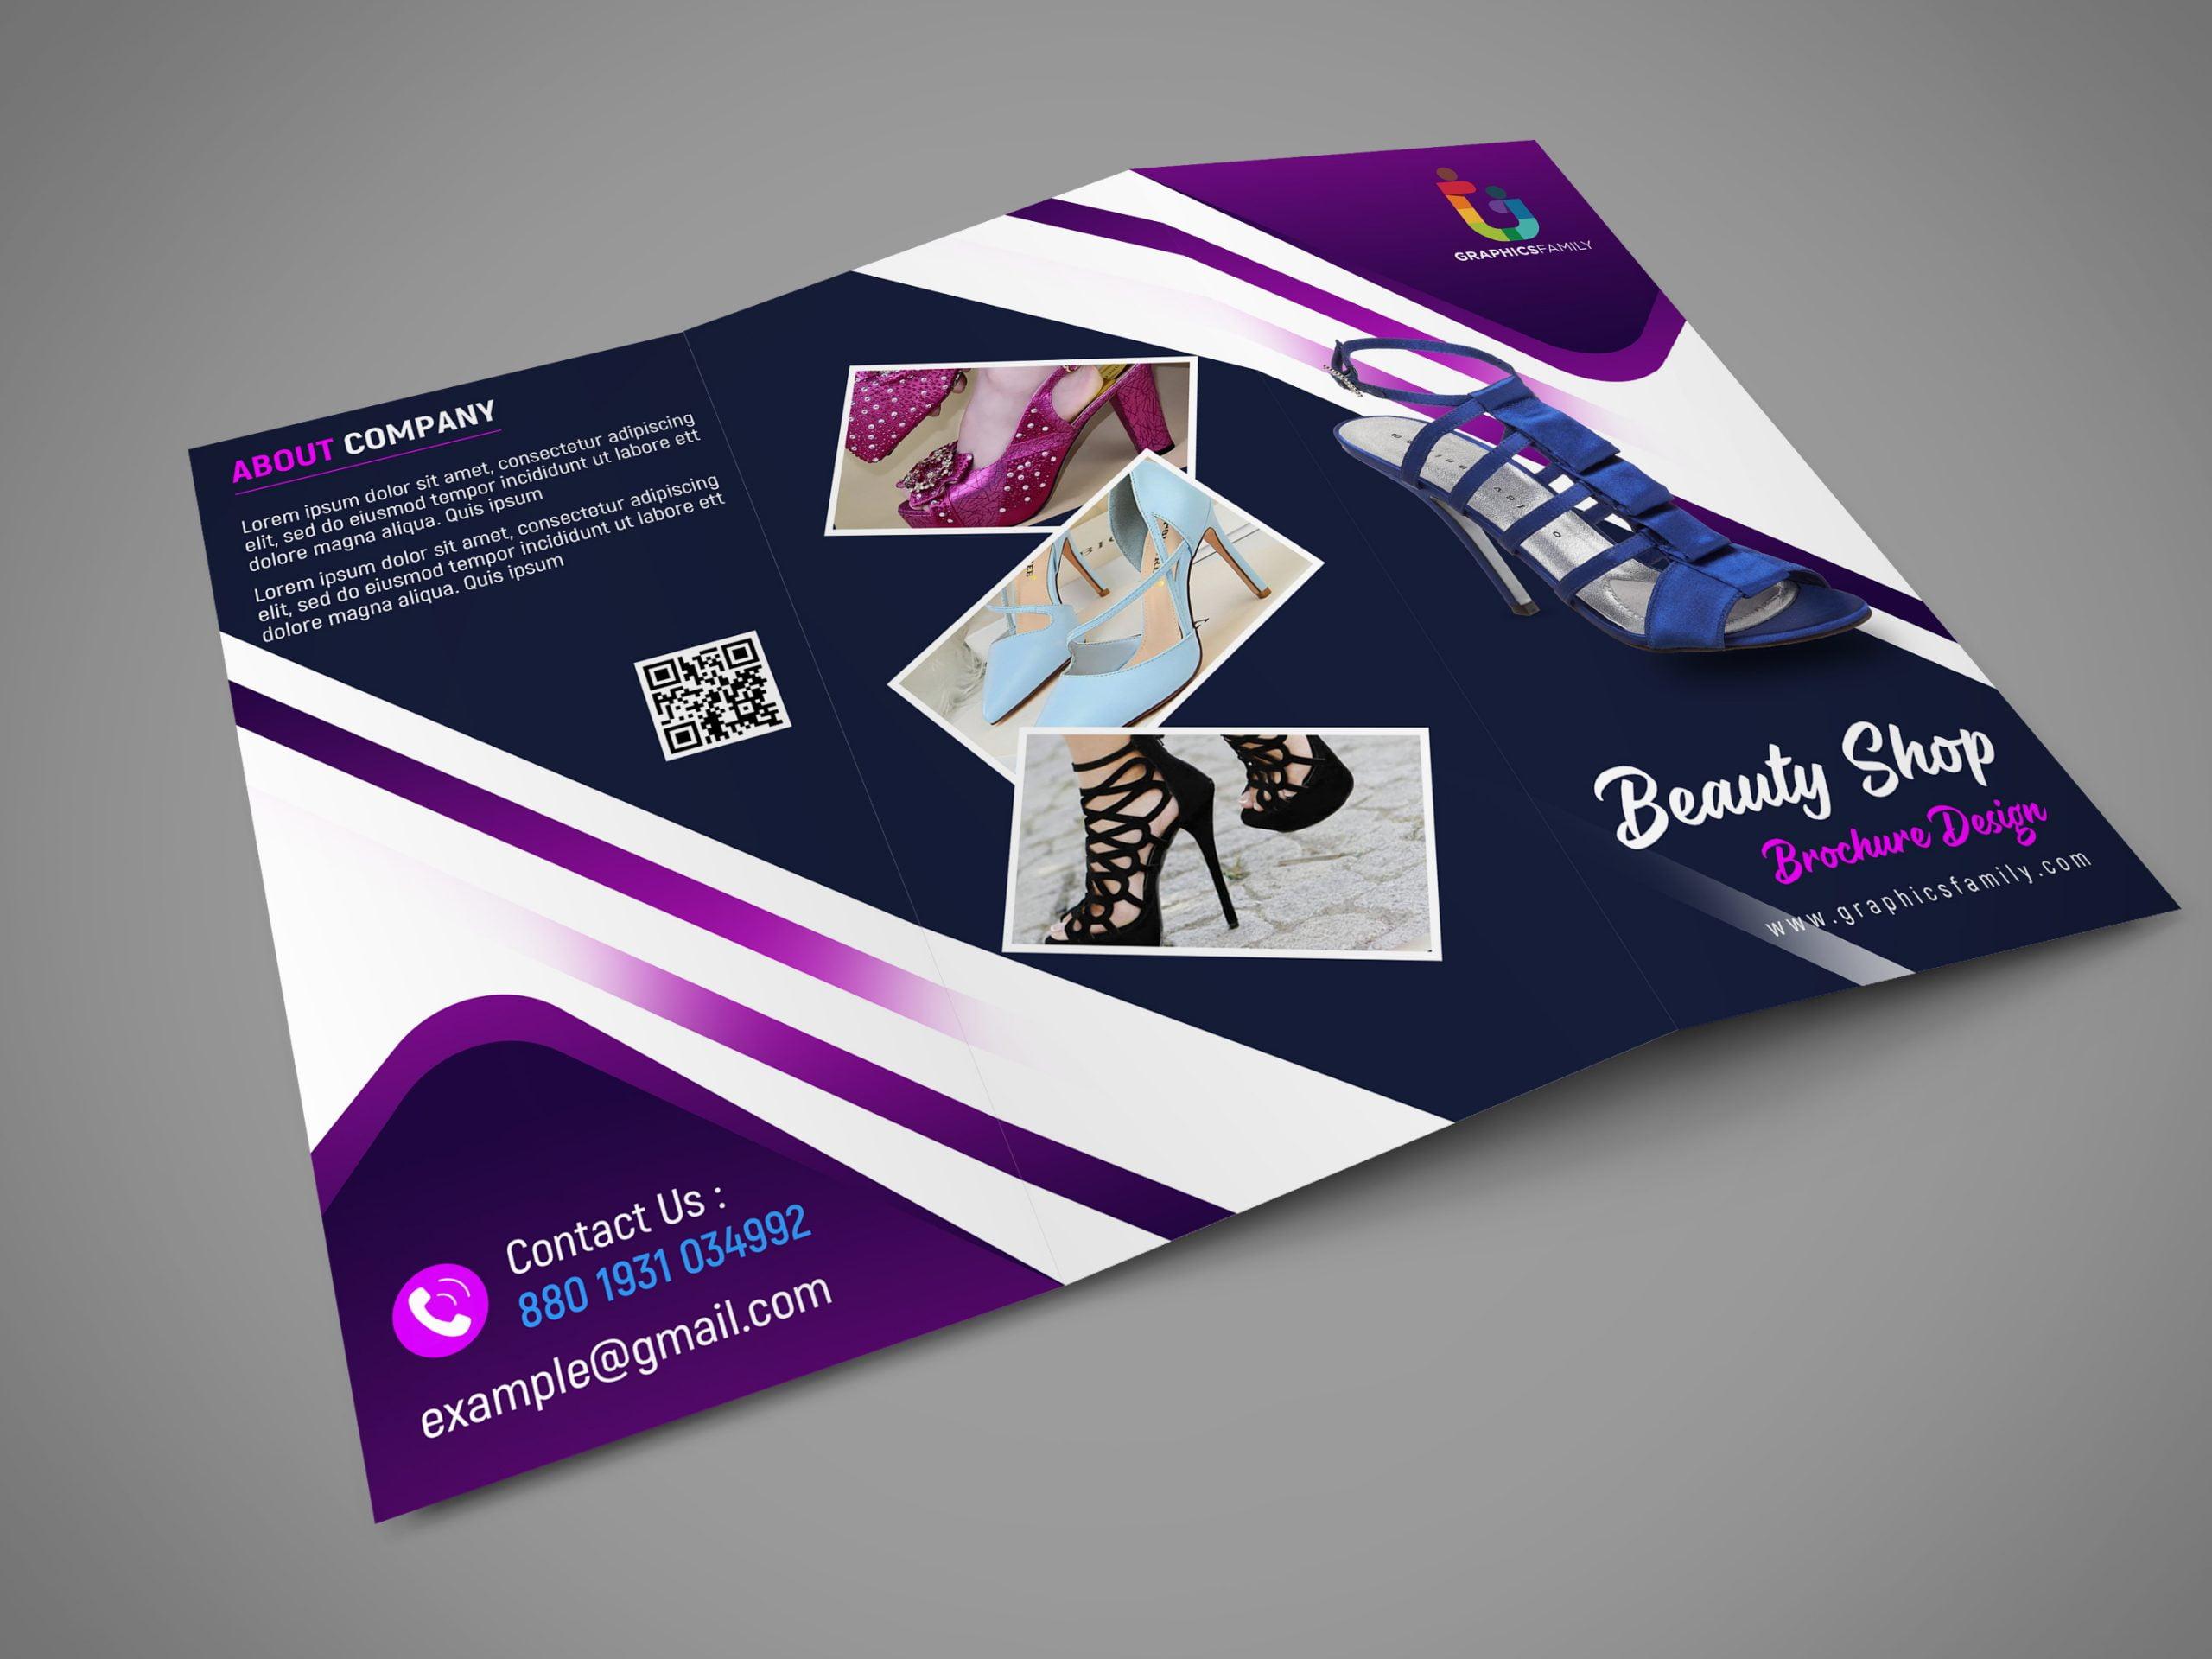 Free Photoshop Editable Trifold Brochure Design